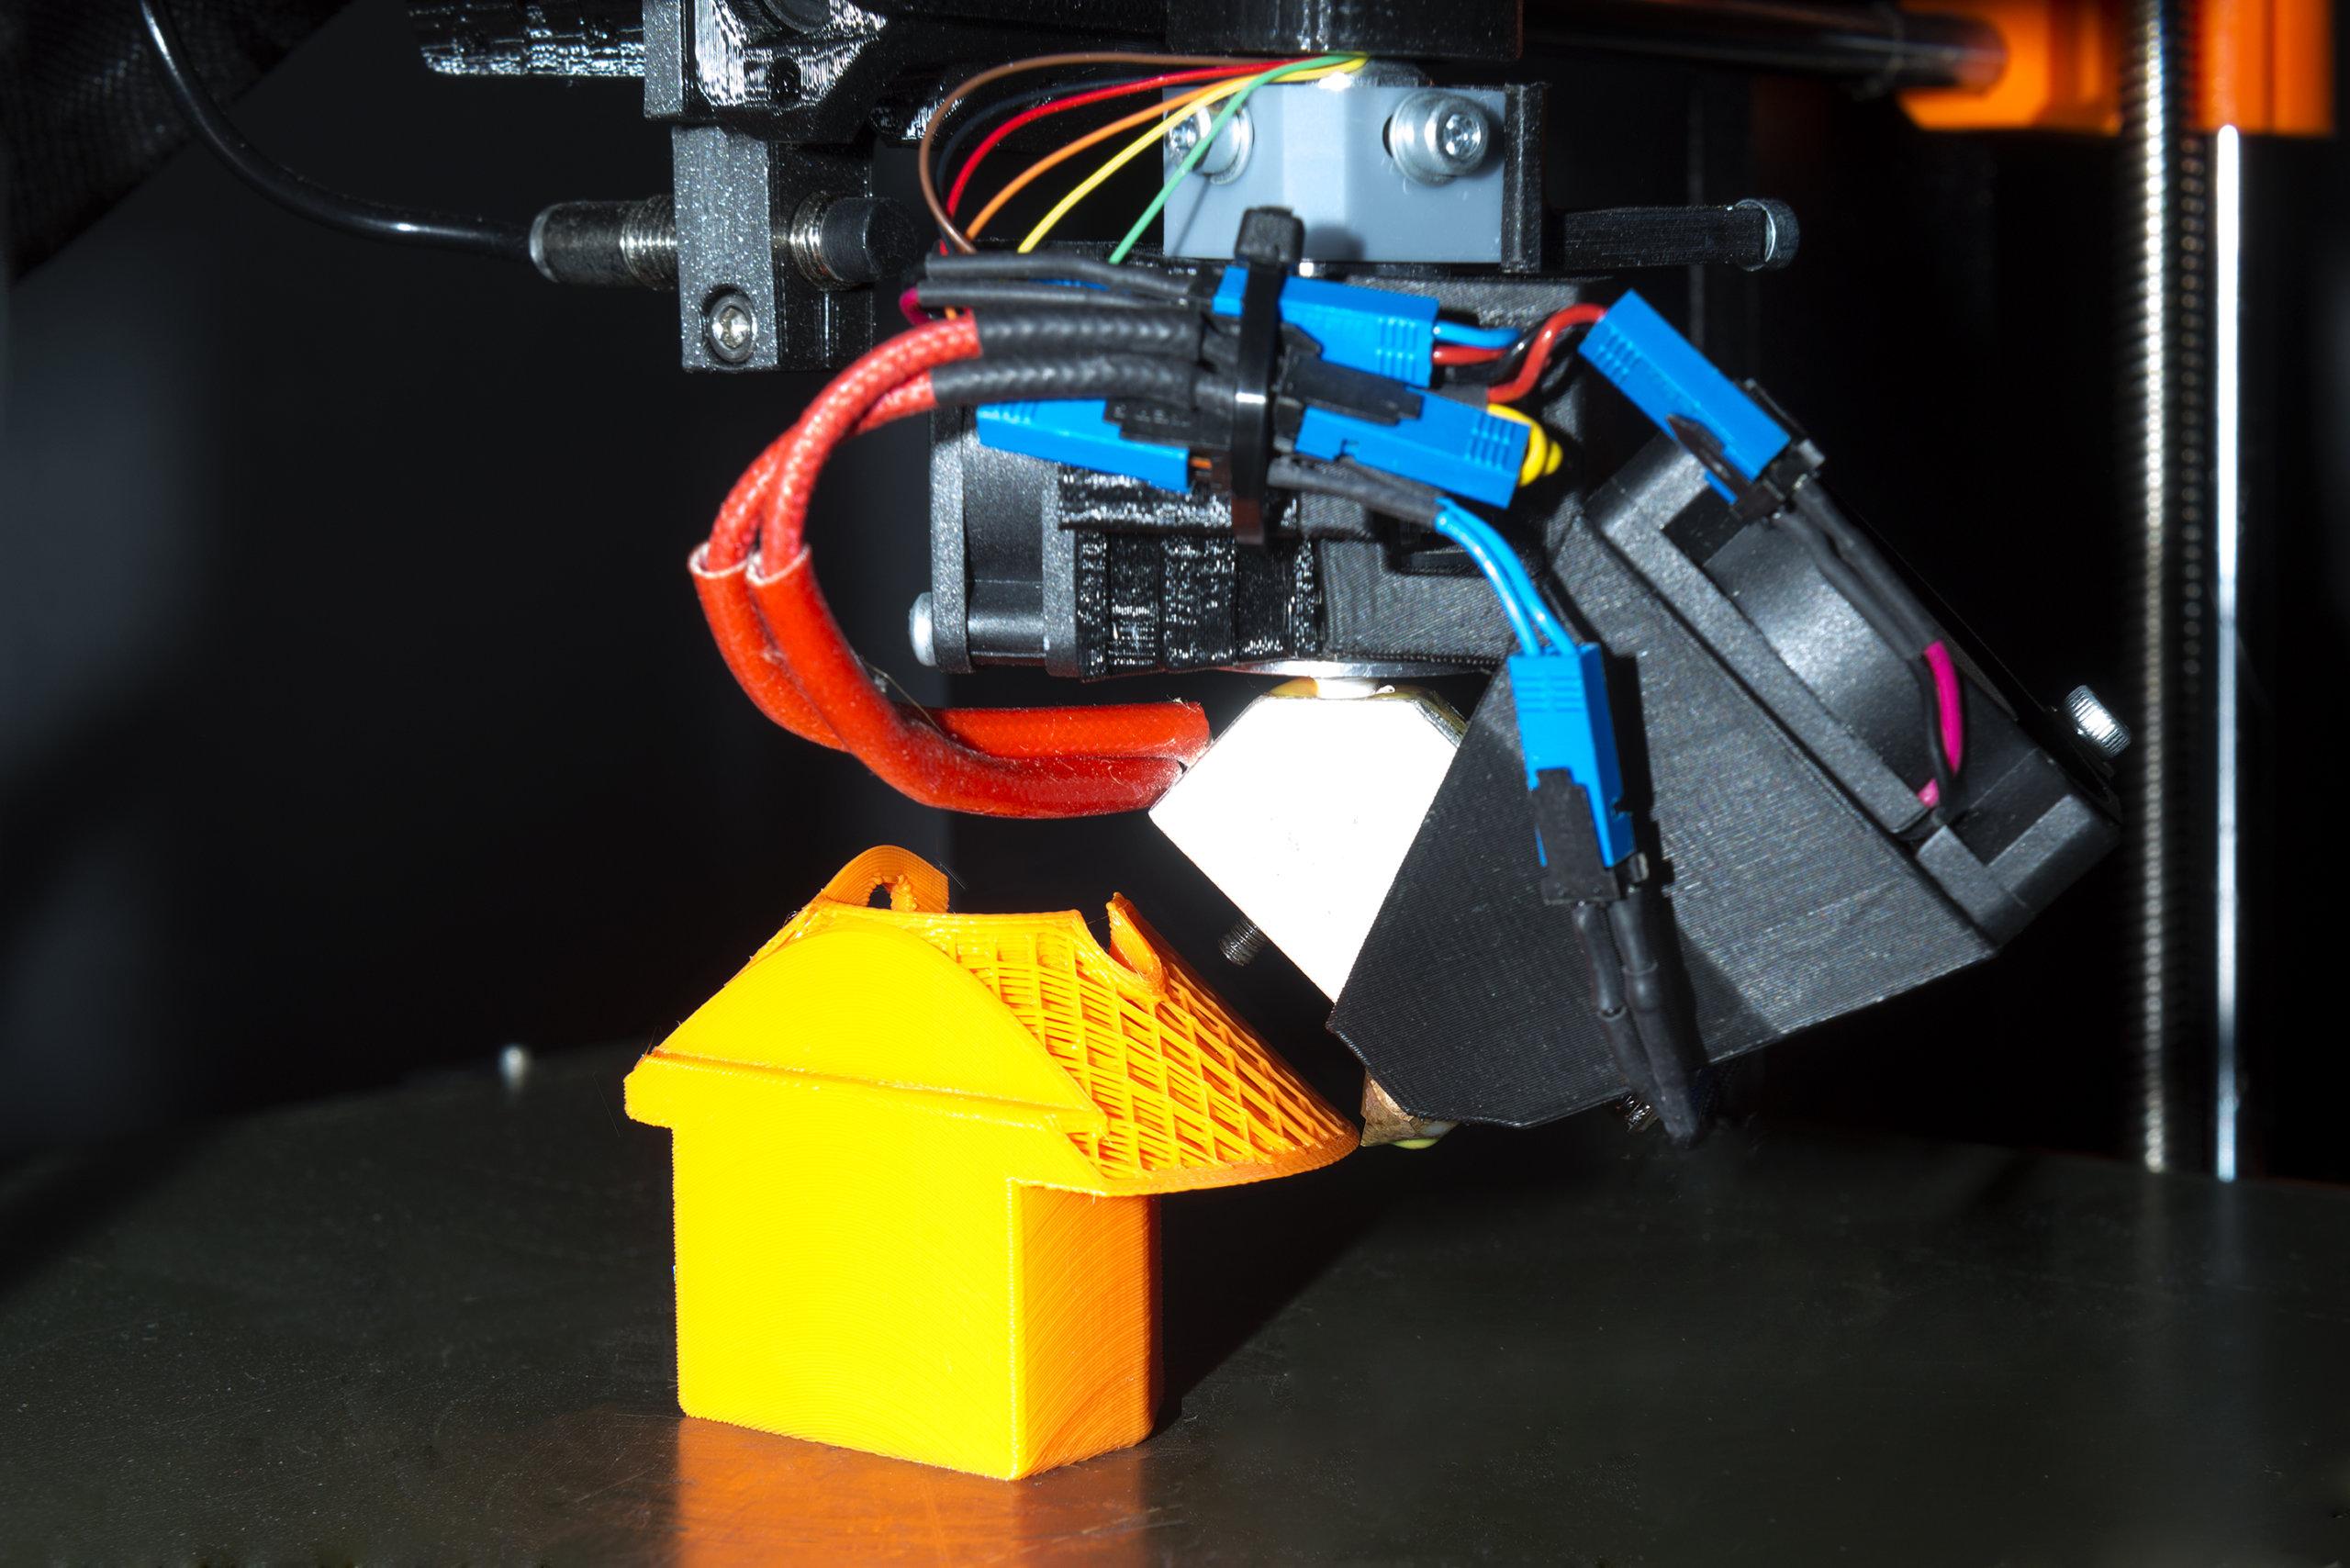 Nahaufnahme 3D-Drucker mit RotBot-Technik